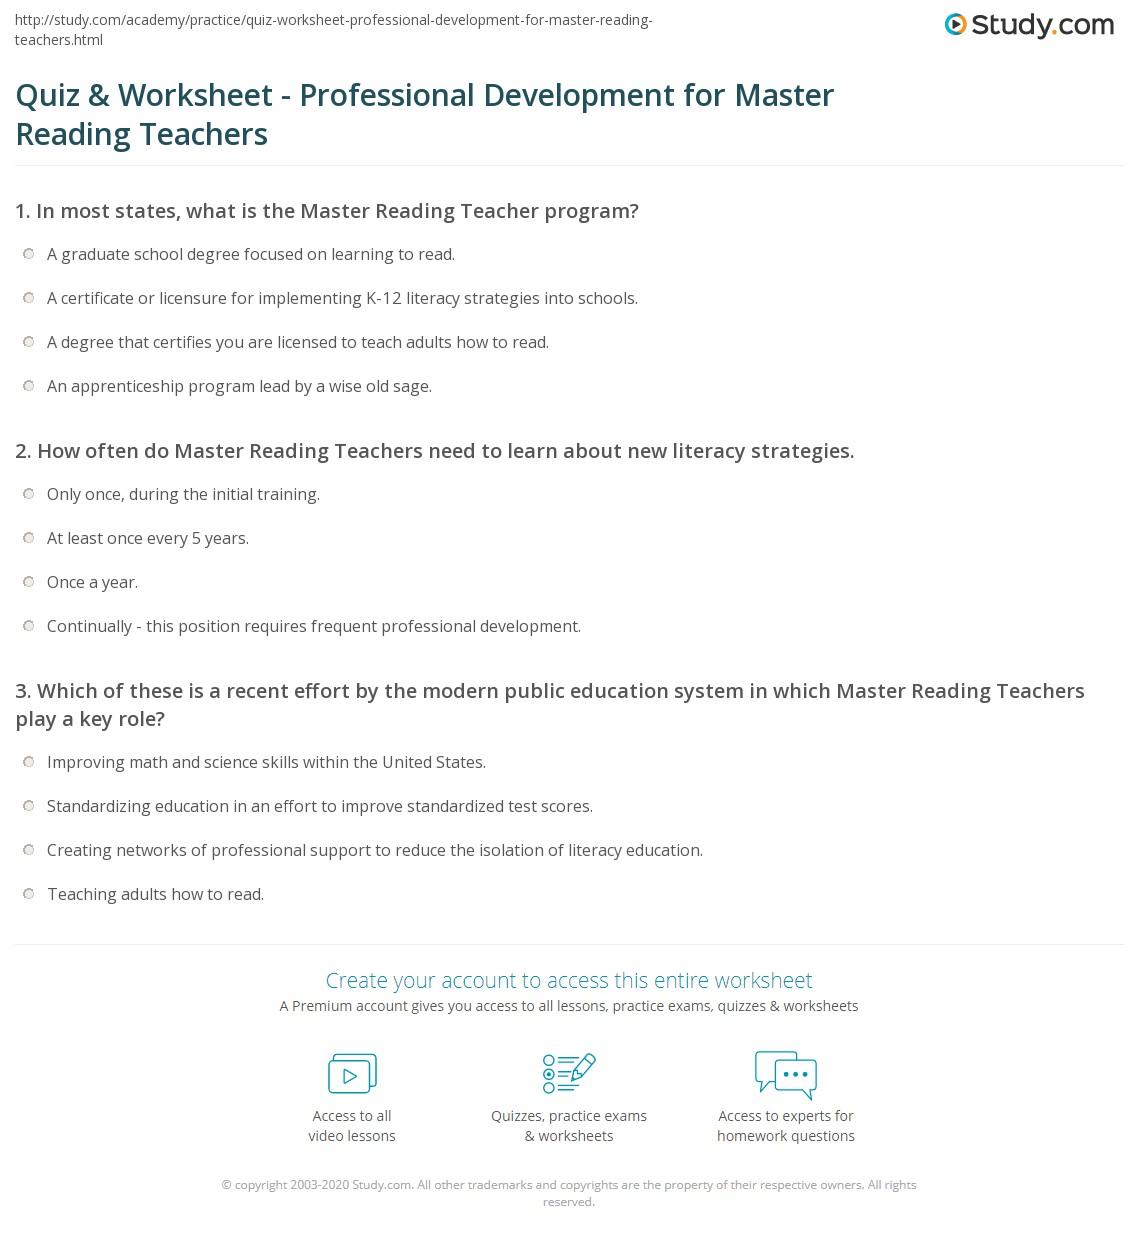 Quiz Worksheet Professional Development For Master Reading